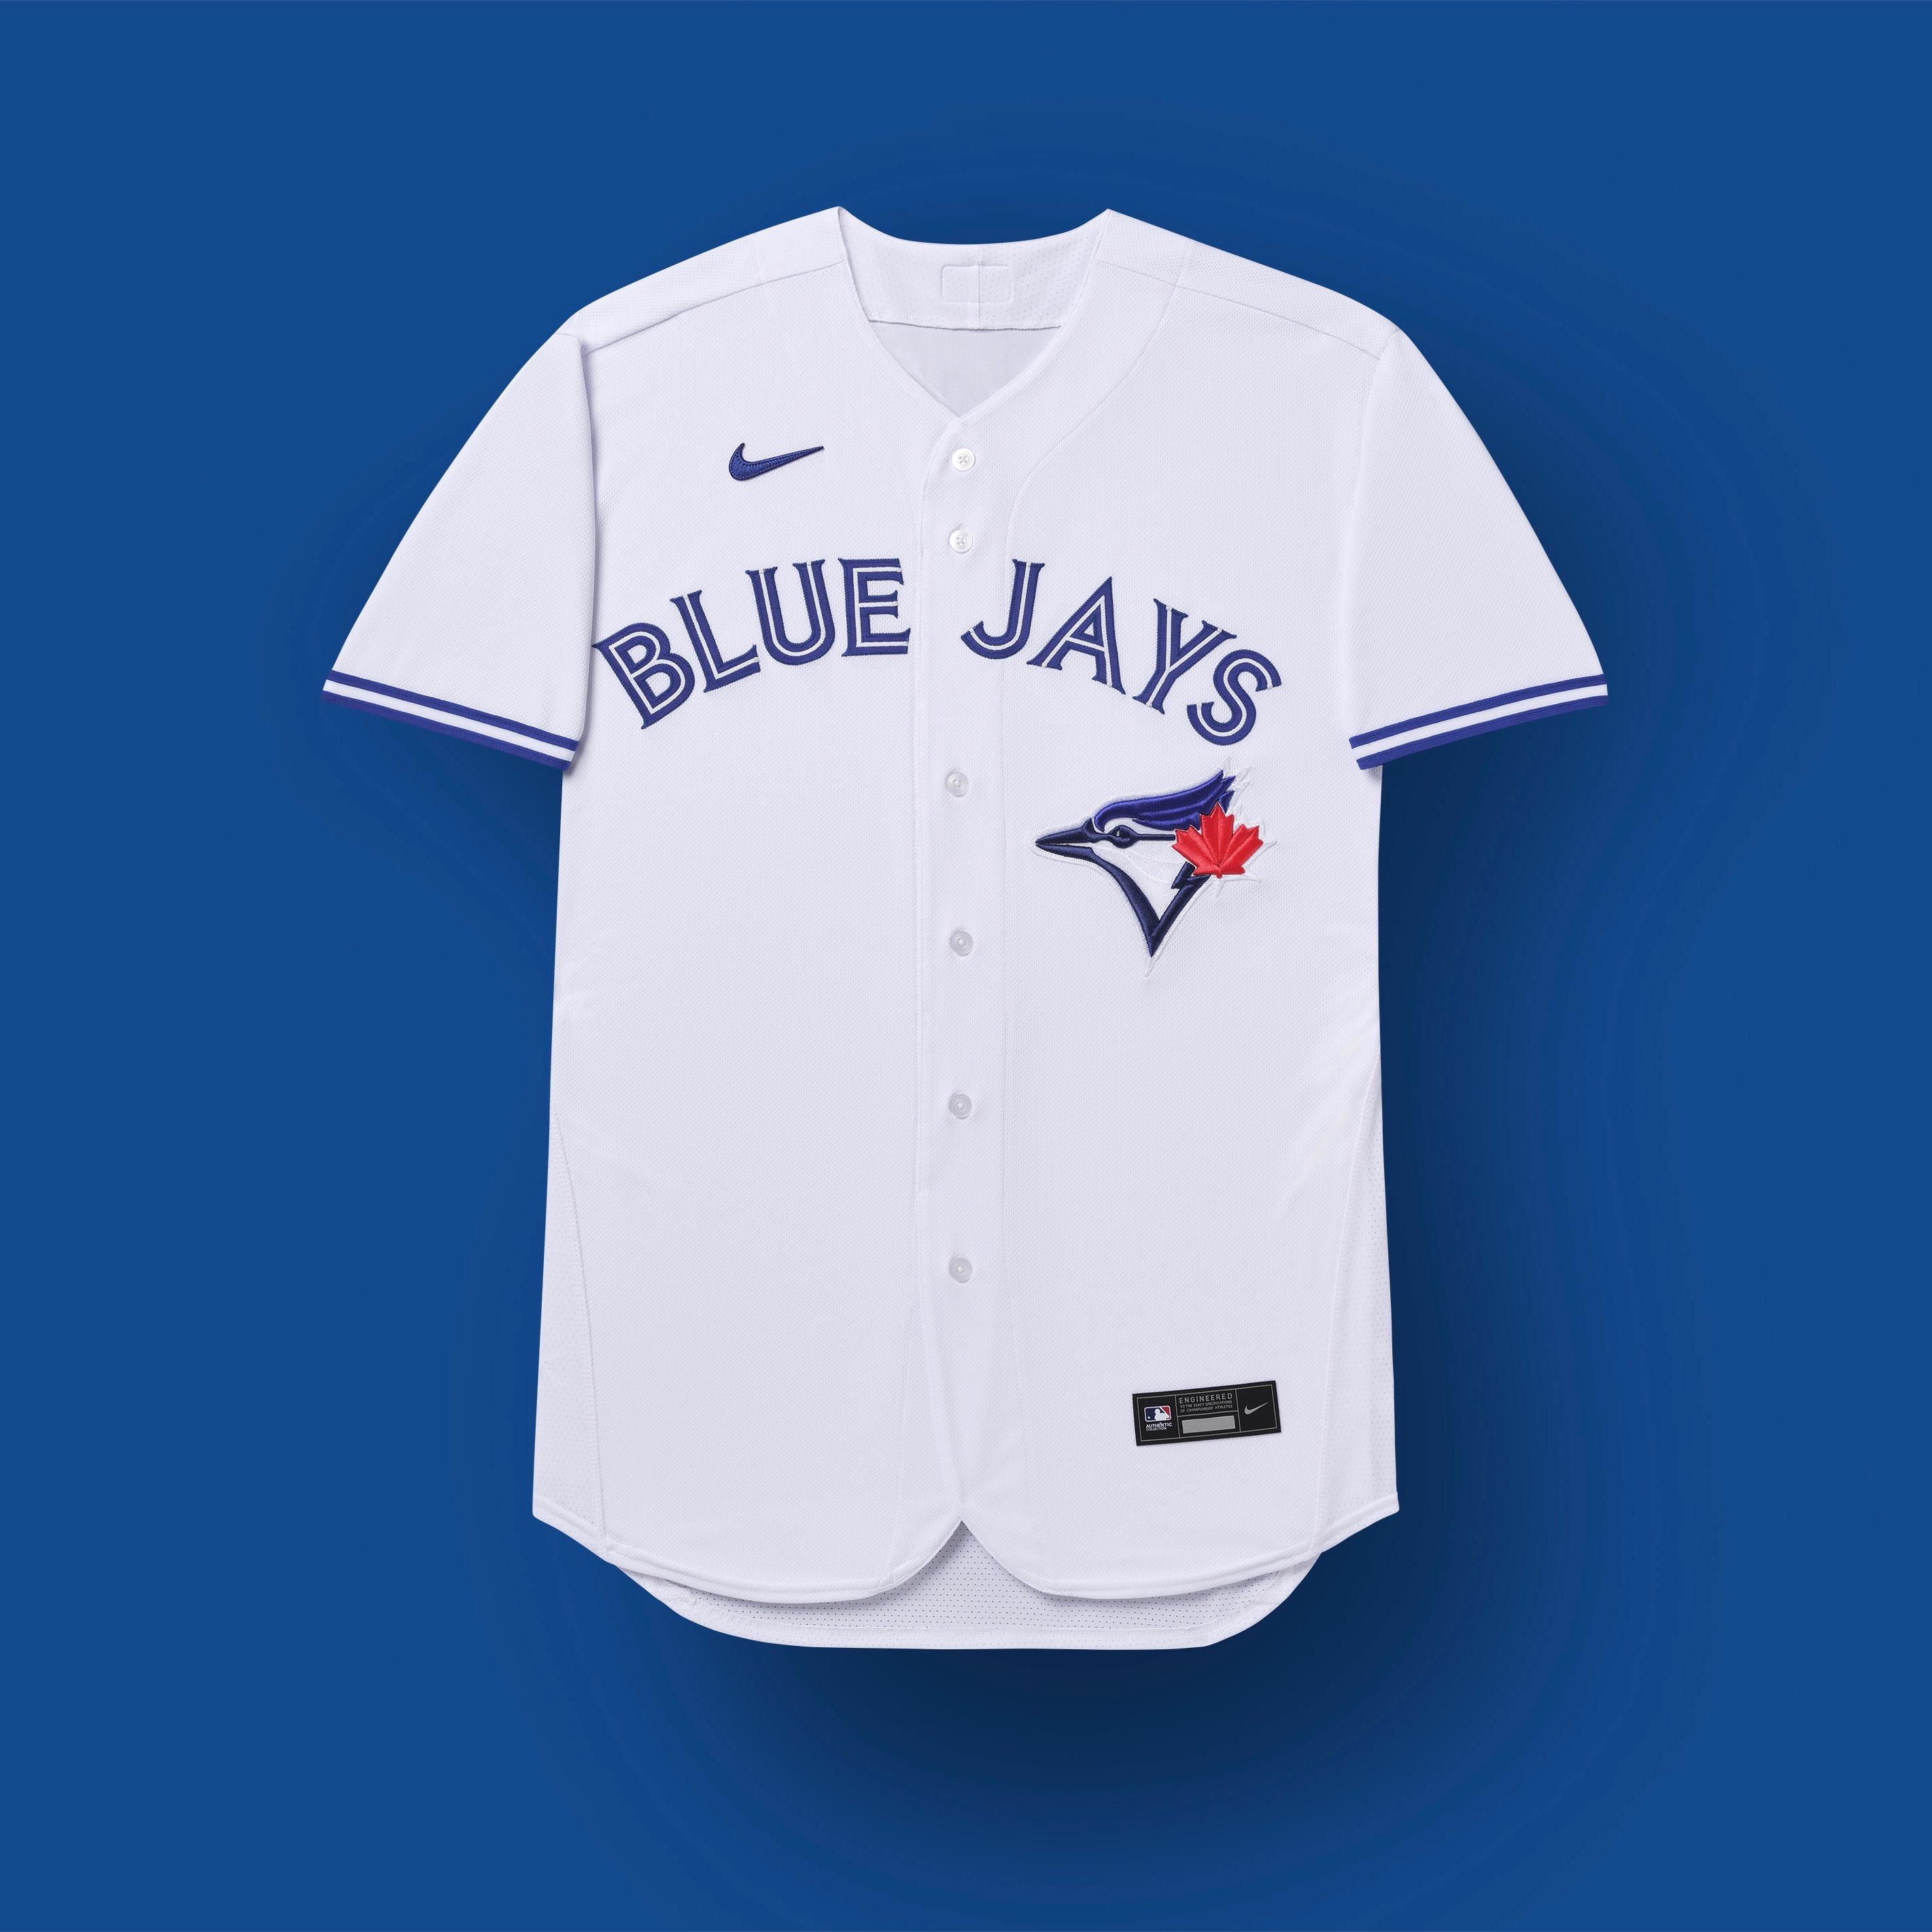 toronto blue jays 2020 uniform